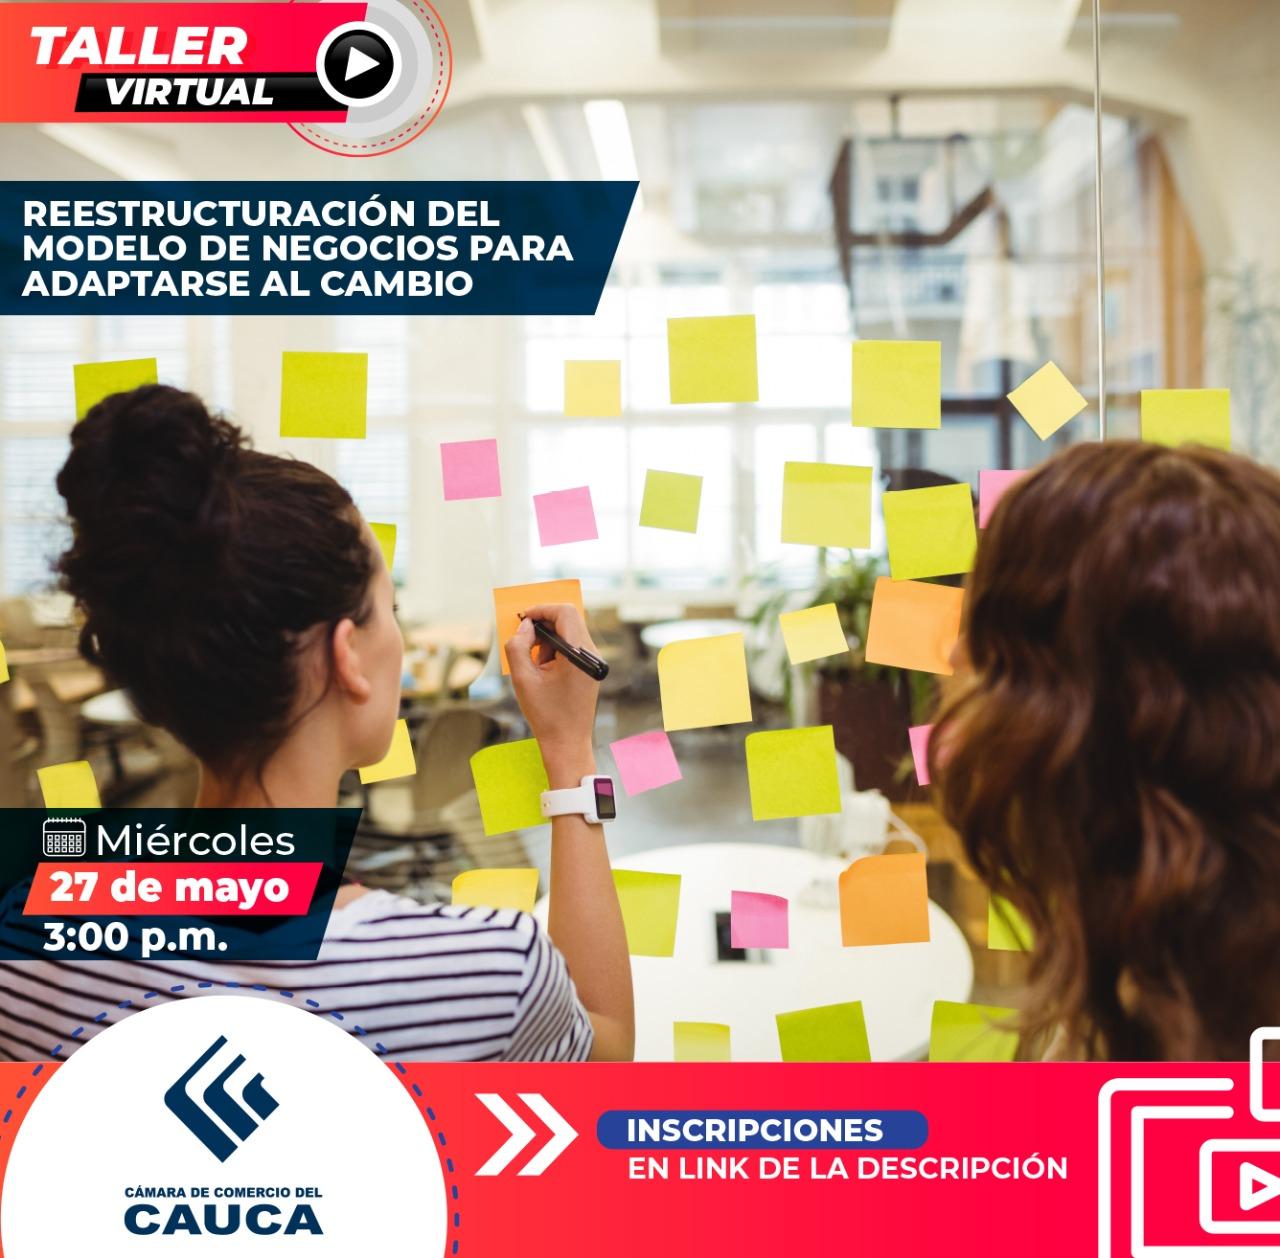 TALLER: Reestructuración del Modelo de negocios para adaptarse al cambio